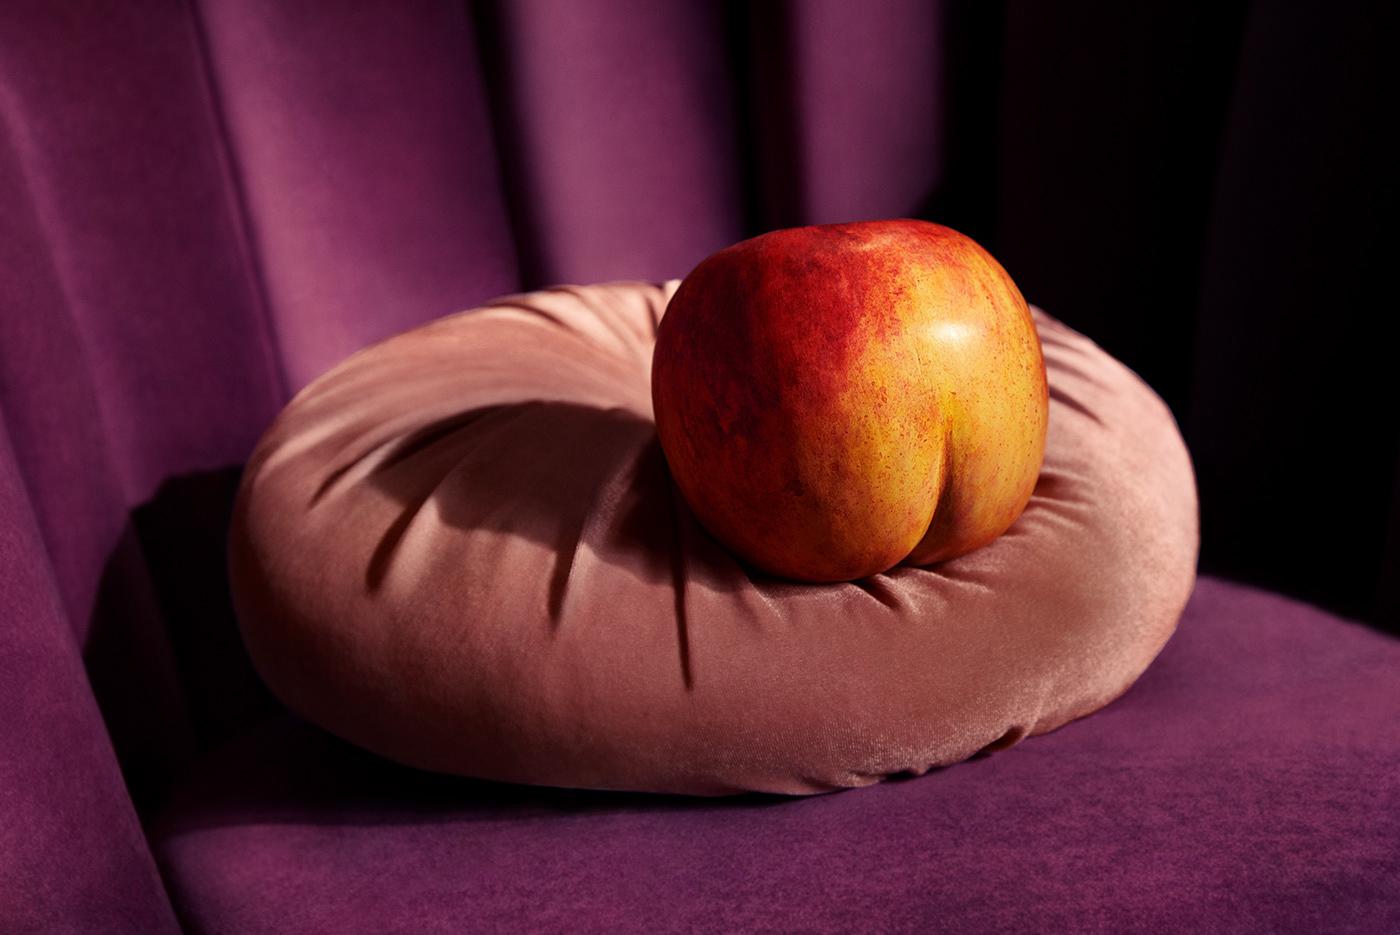 klarna,advertisement,Film  ,humour,peach,blowupdoll,SNASK